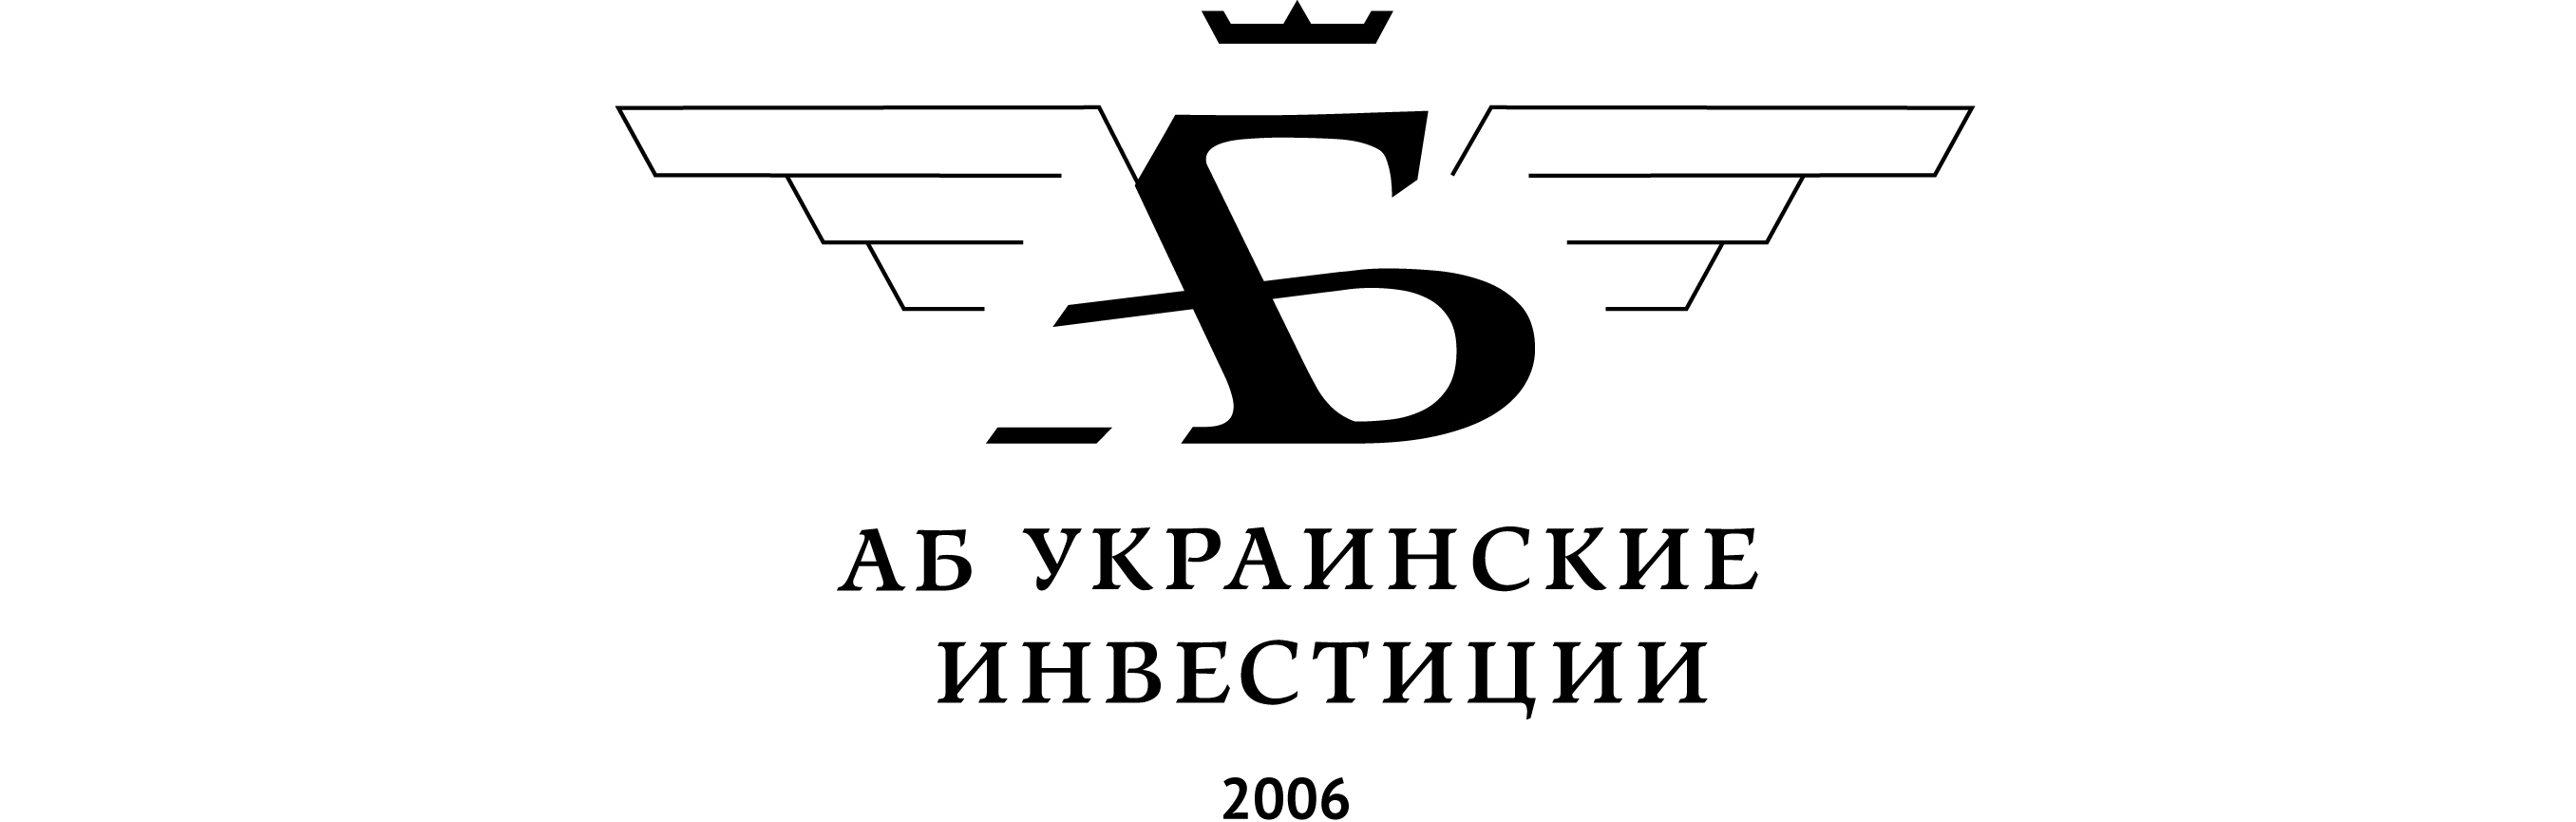 AB_presenta1tion_logo-5